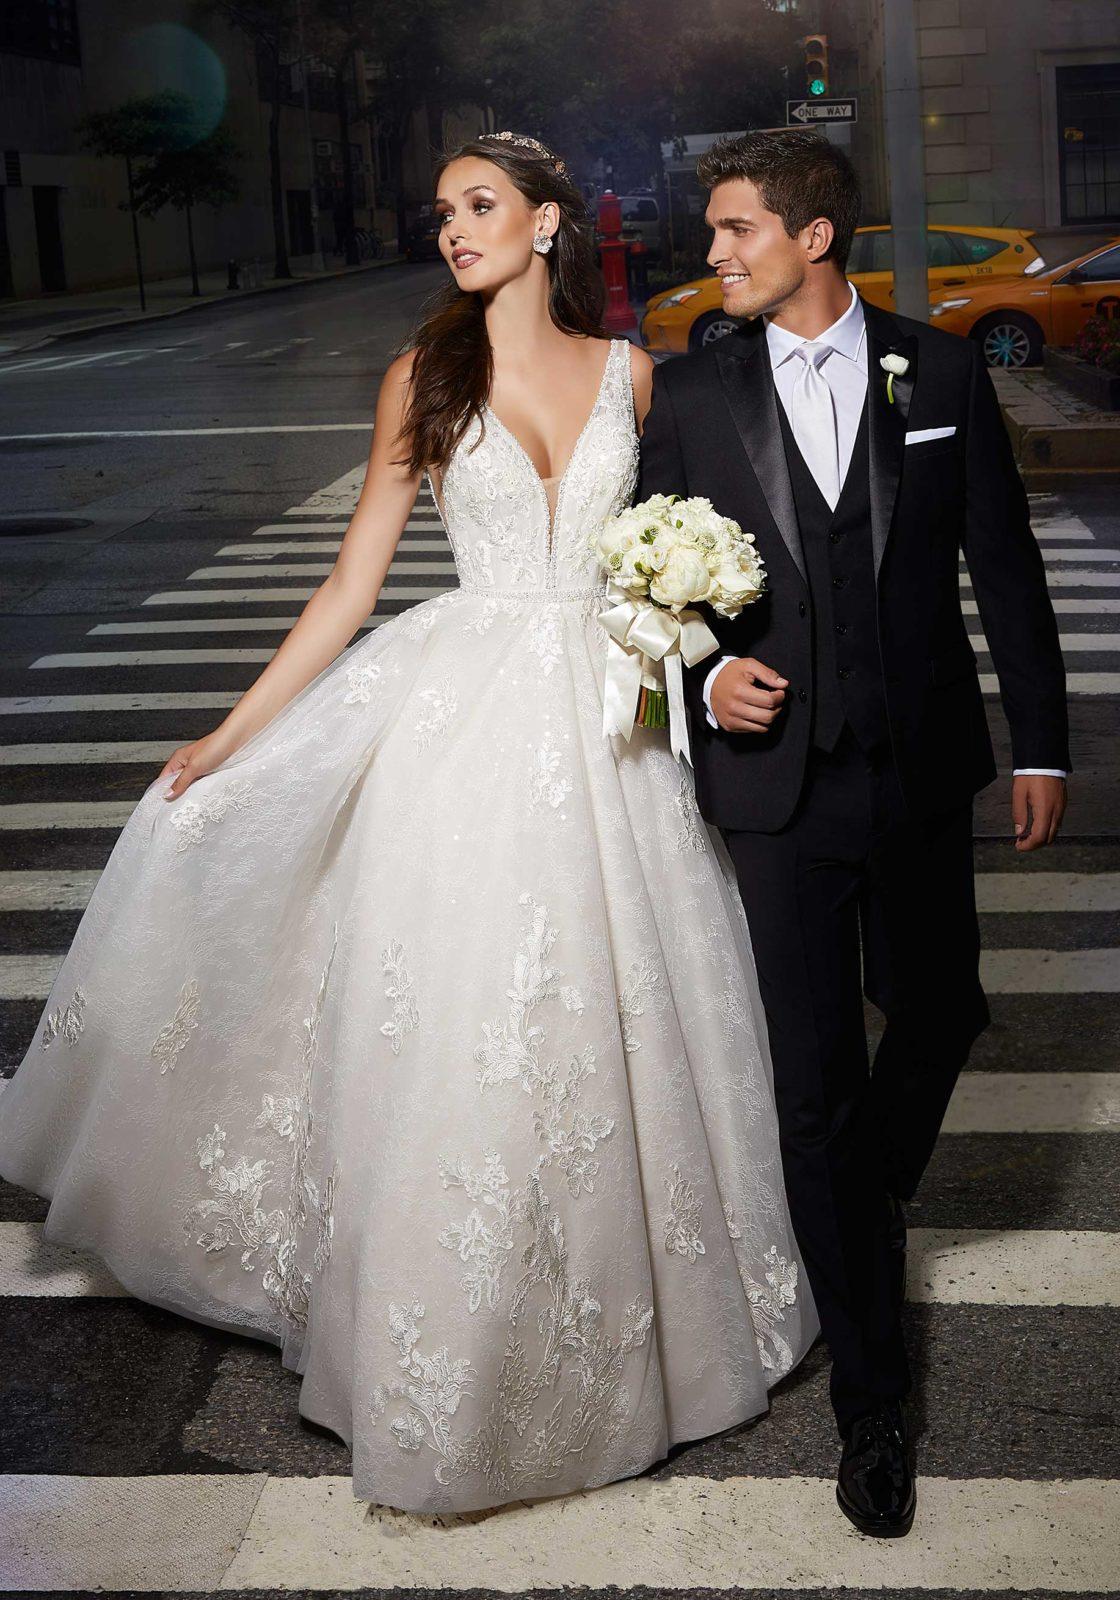 Designer: Morilee - Madiline Gardner Signature Collection - Savannah Wedding Dress - 1019